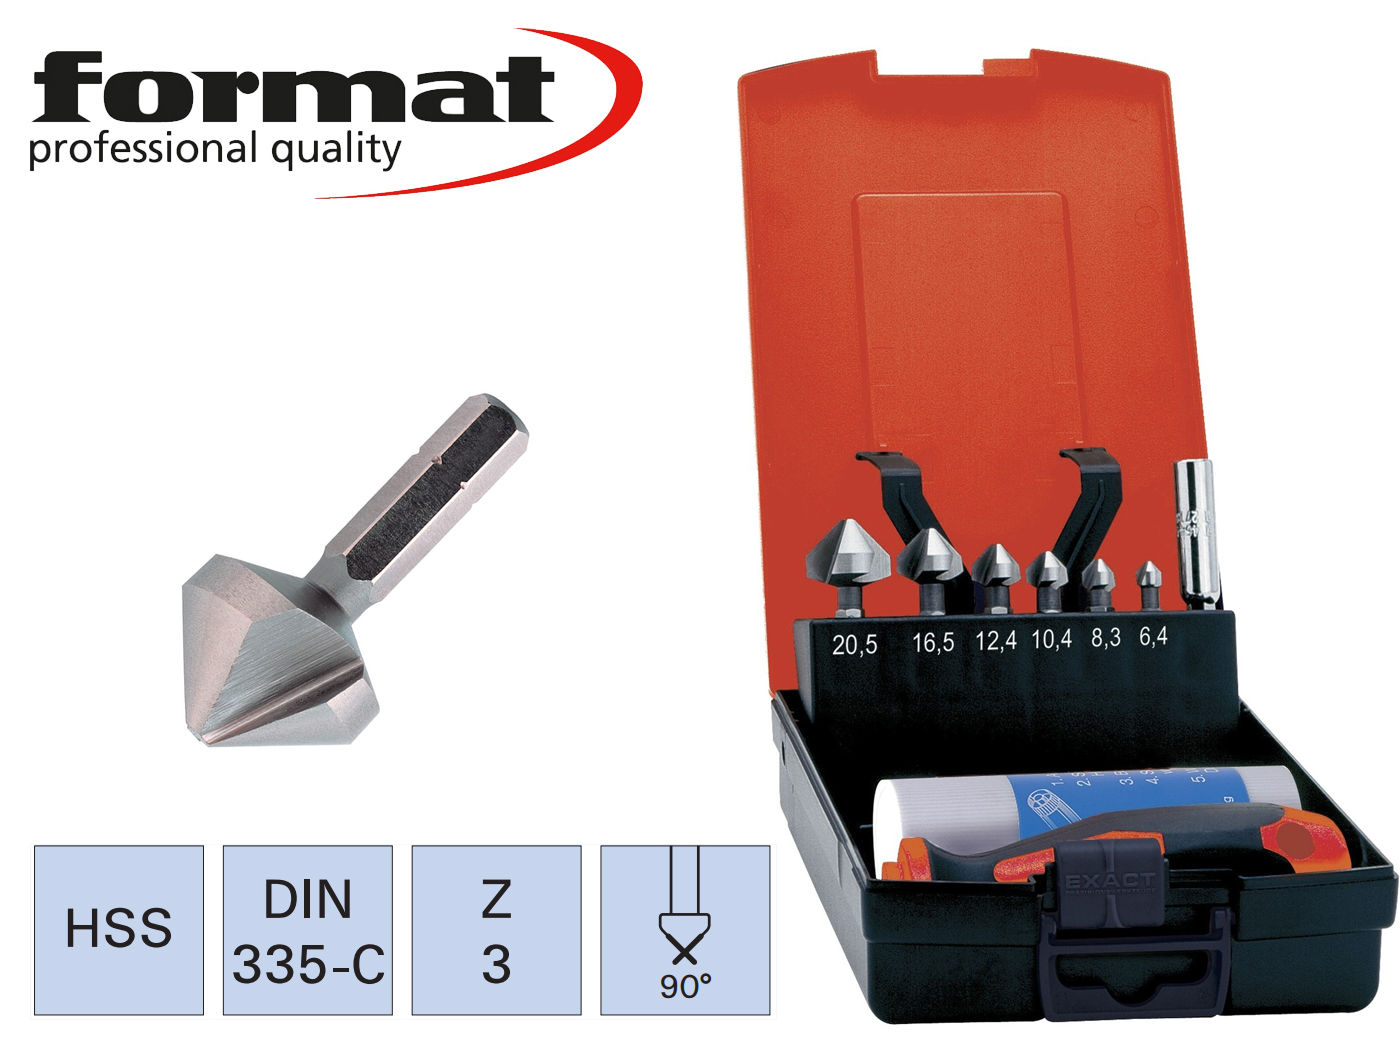 verzinkboren Bit set HSS DIN 335 C 90G FORMAT | DKMTools - DKM Tools